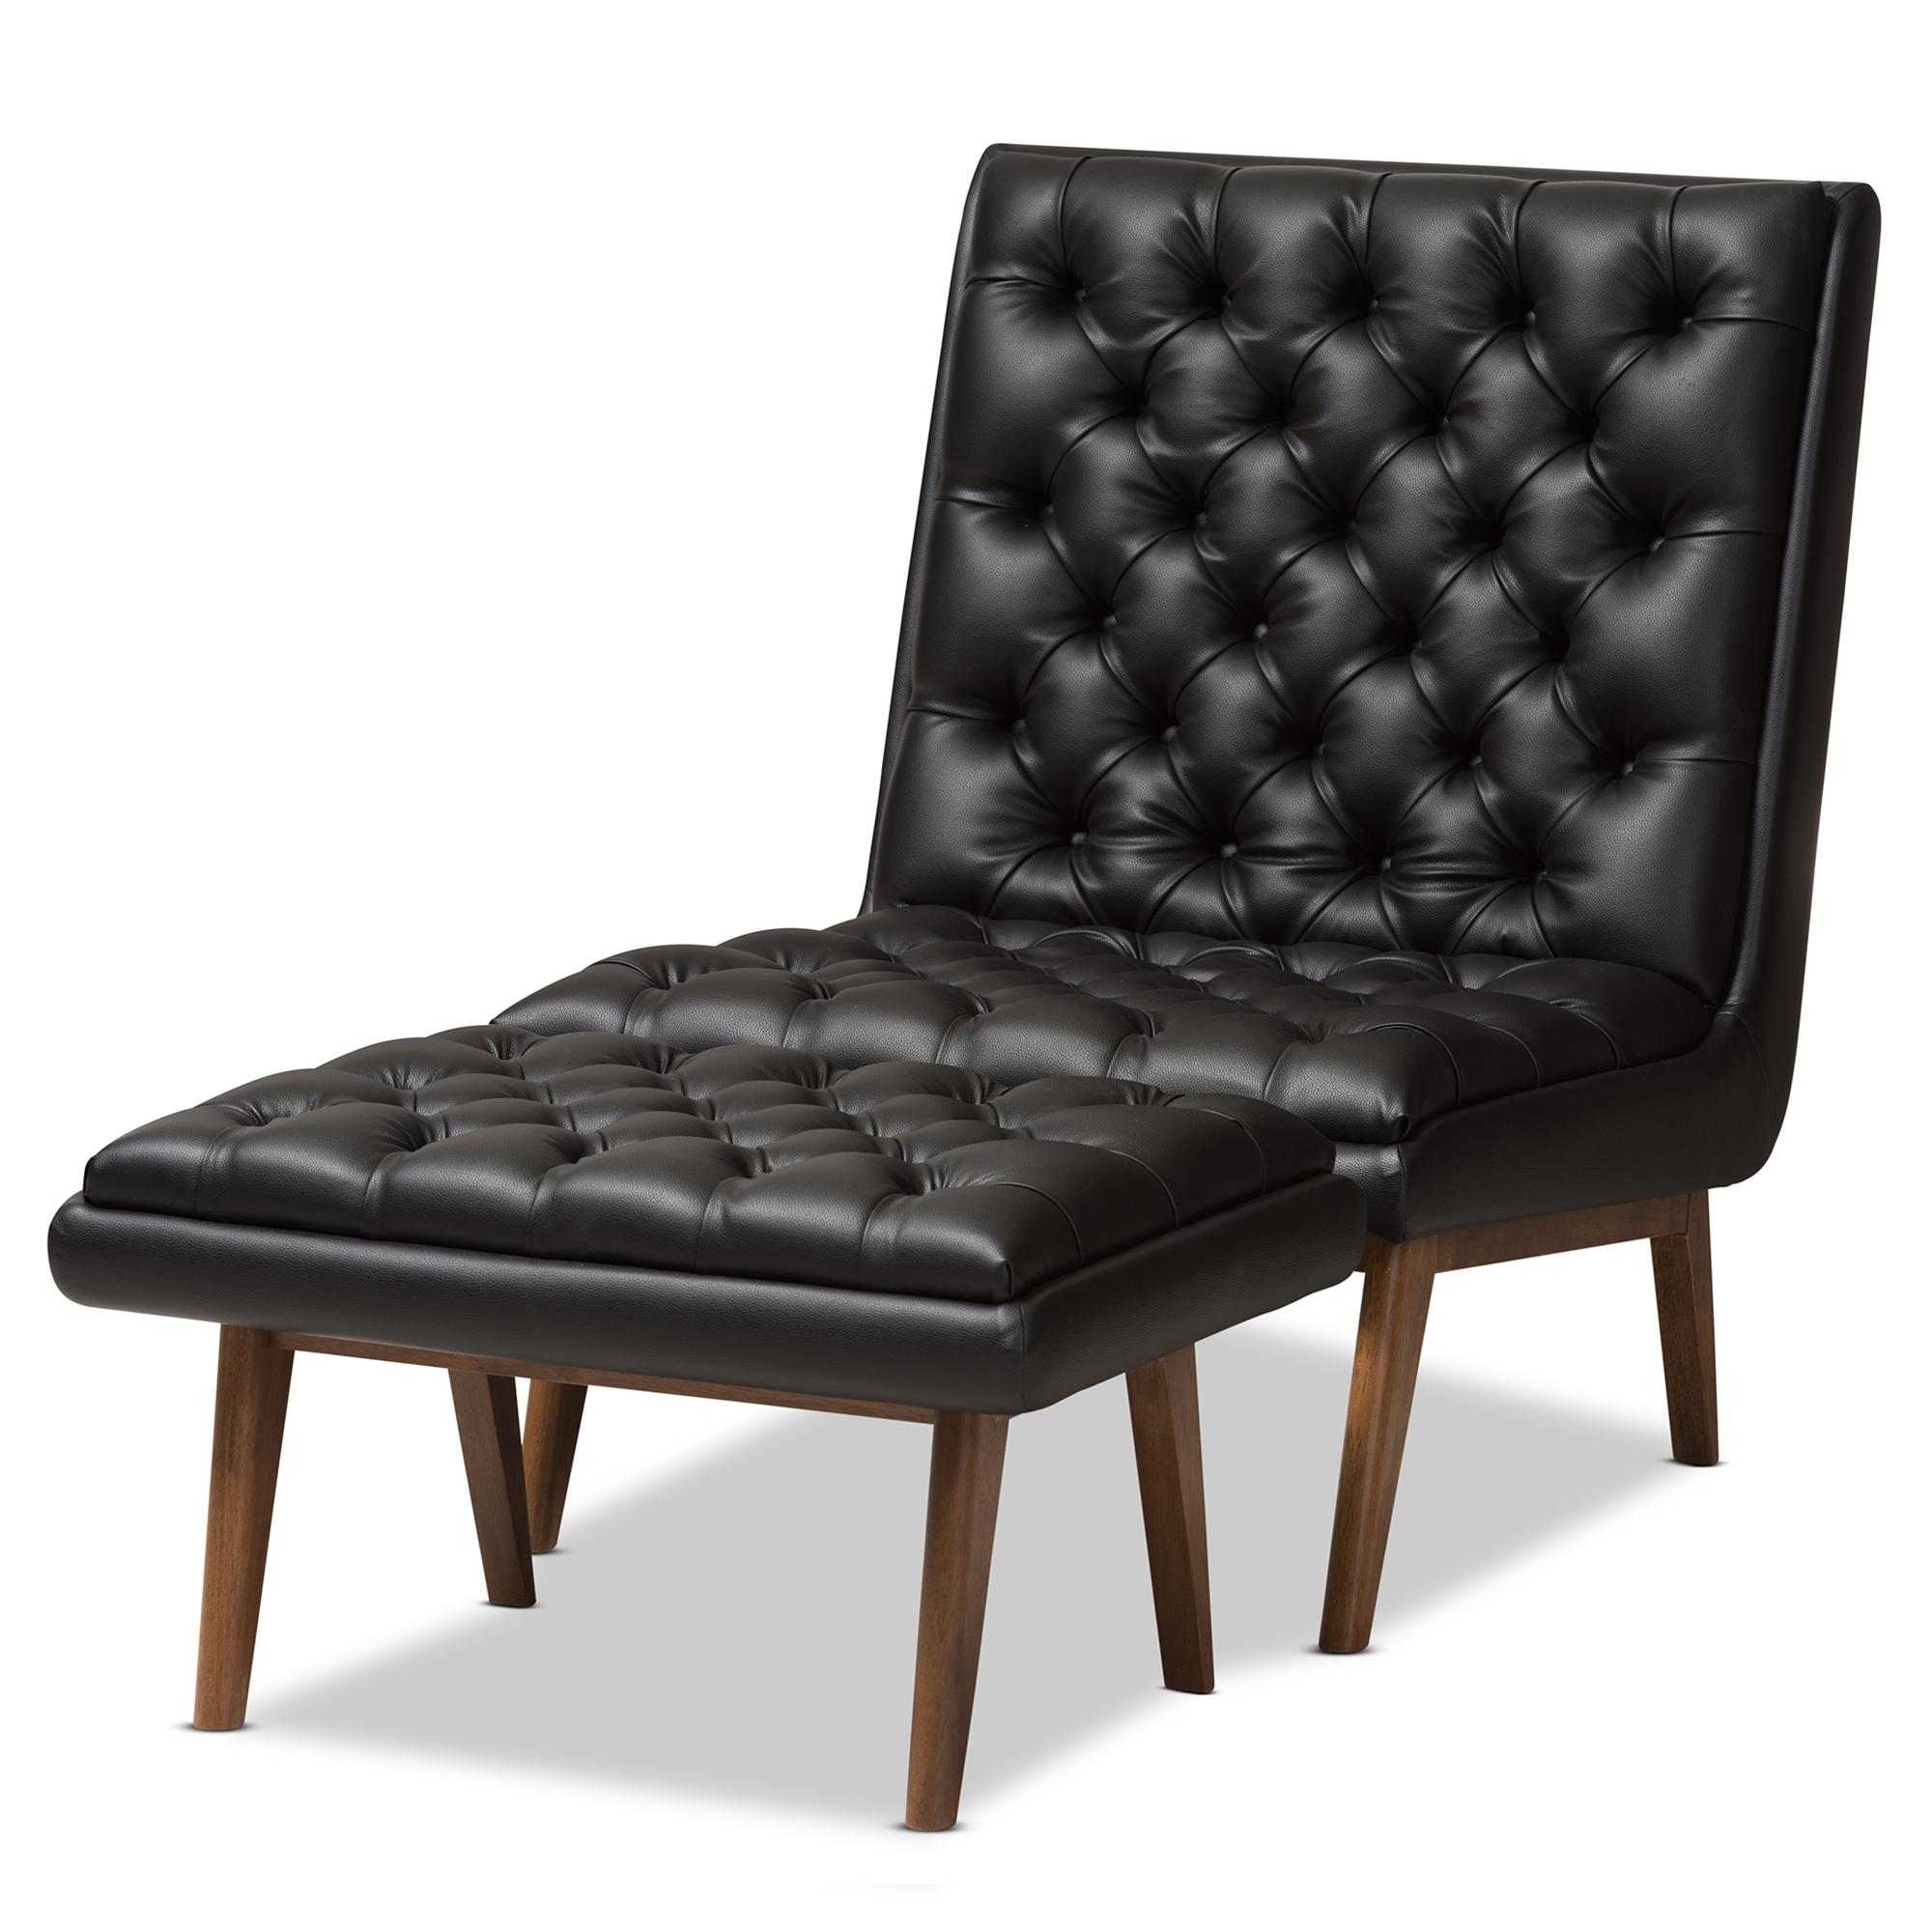 baxton studio annetha mid century modern black faux leather upholstered walnut finished wood. Black Bedroom Furniture Sets. Home Design Ideas